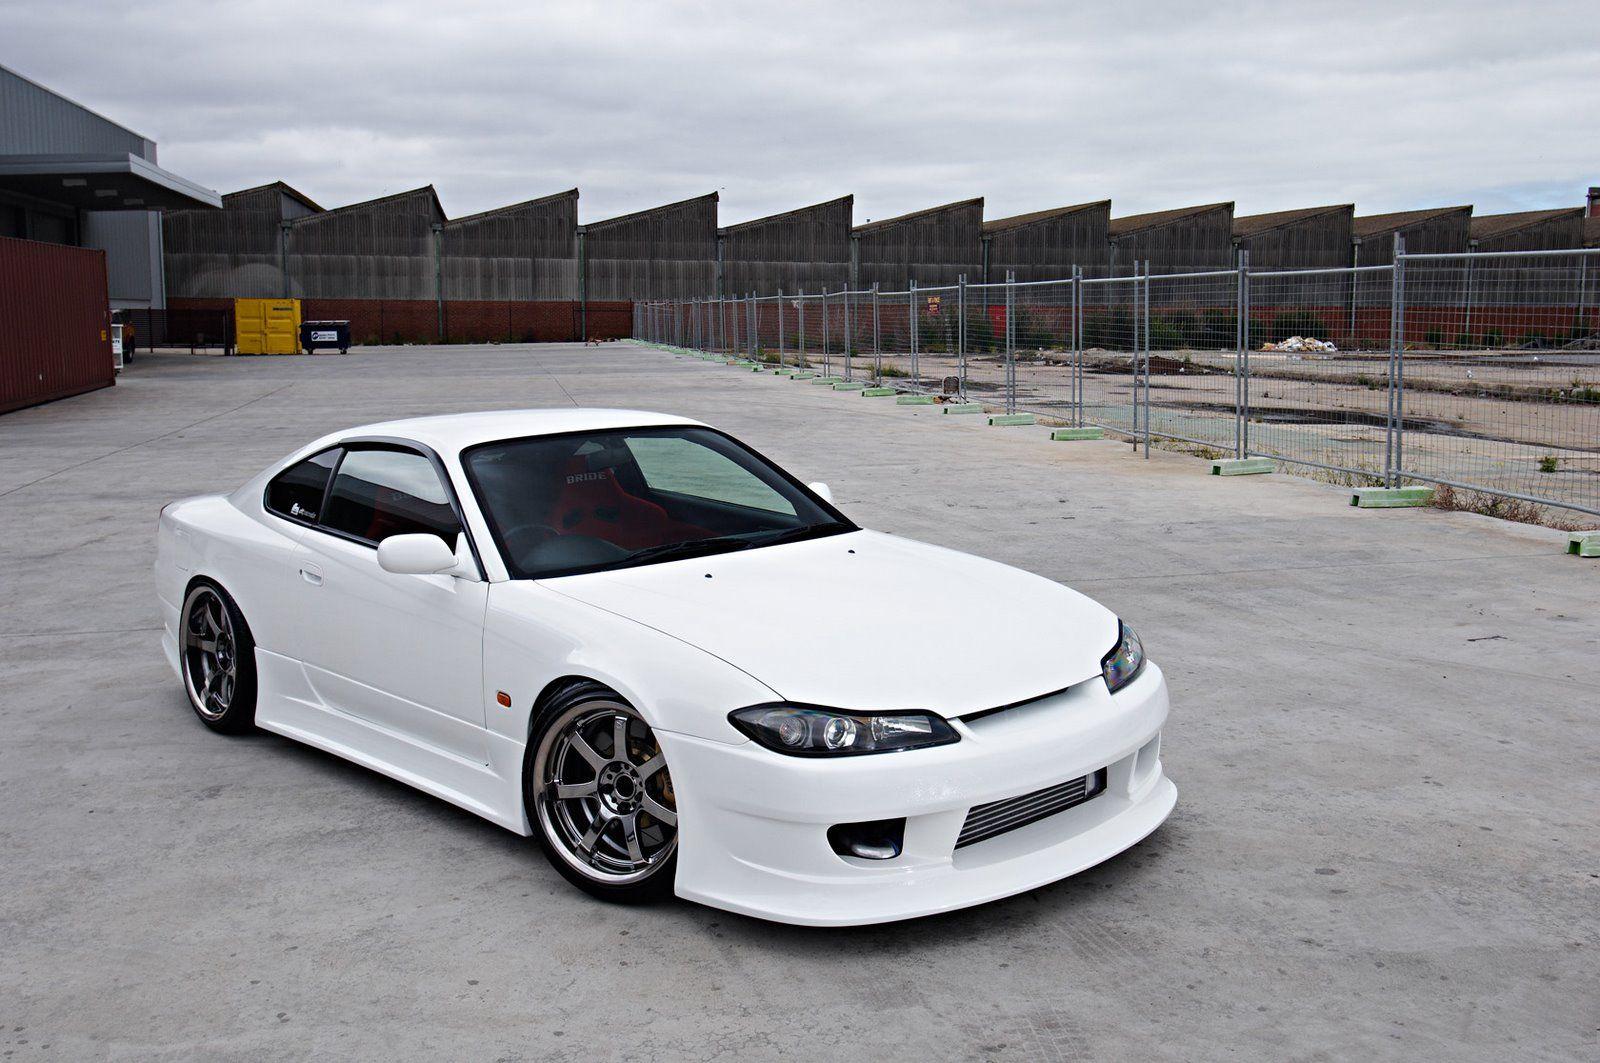 Silvia mobili ~ Nissan s15 i like http: extreme modified.com my first